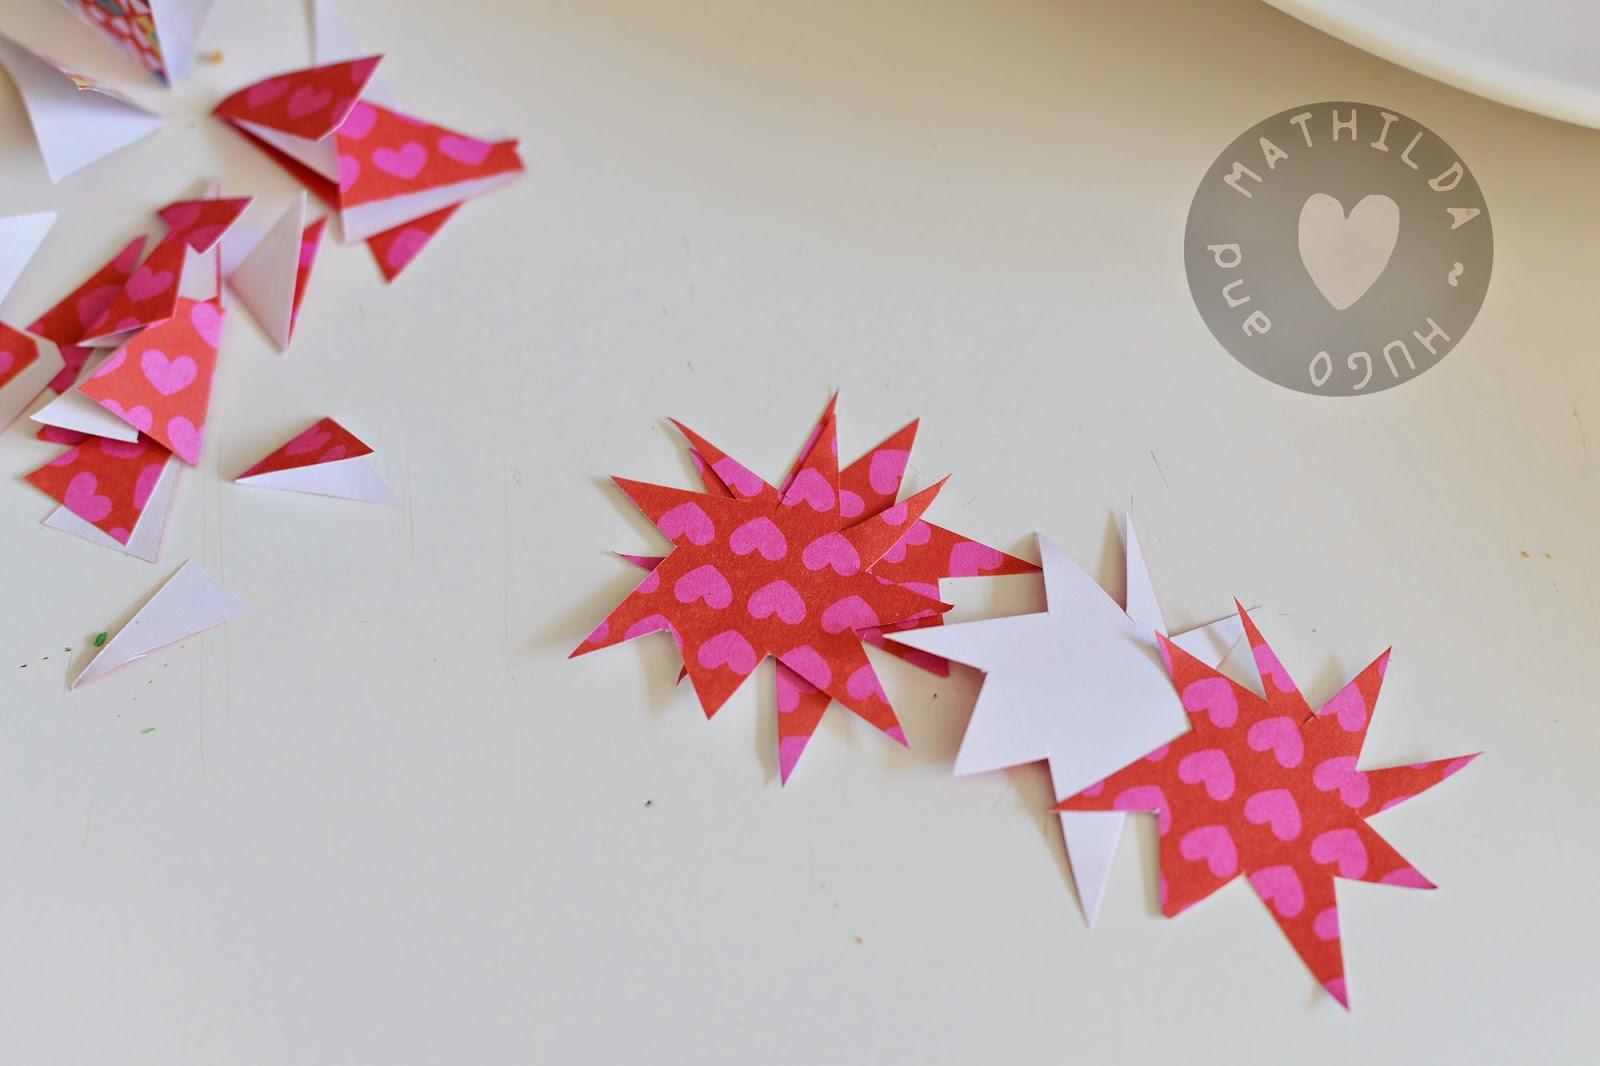 Cake Decoration With Paper : Hugo and Mathilda: Paper cake decoration - children s art